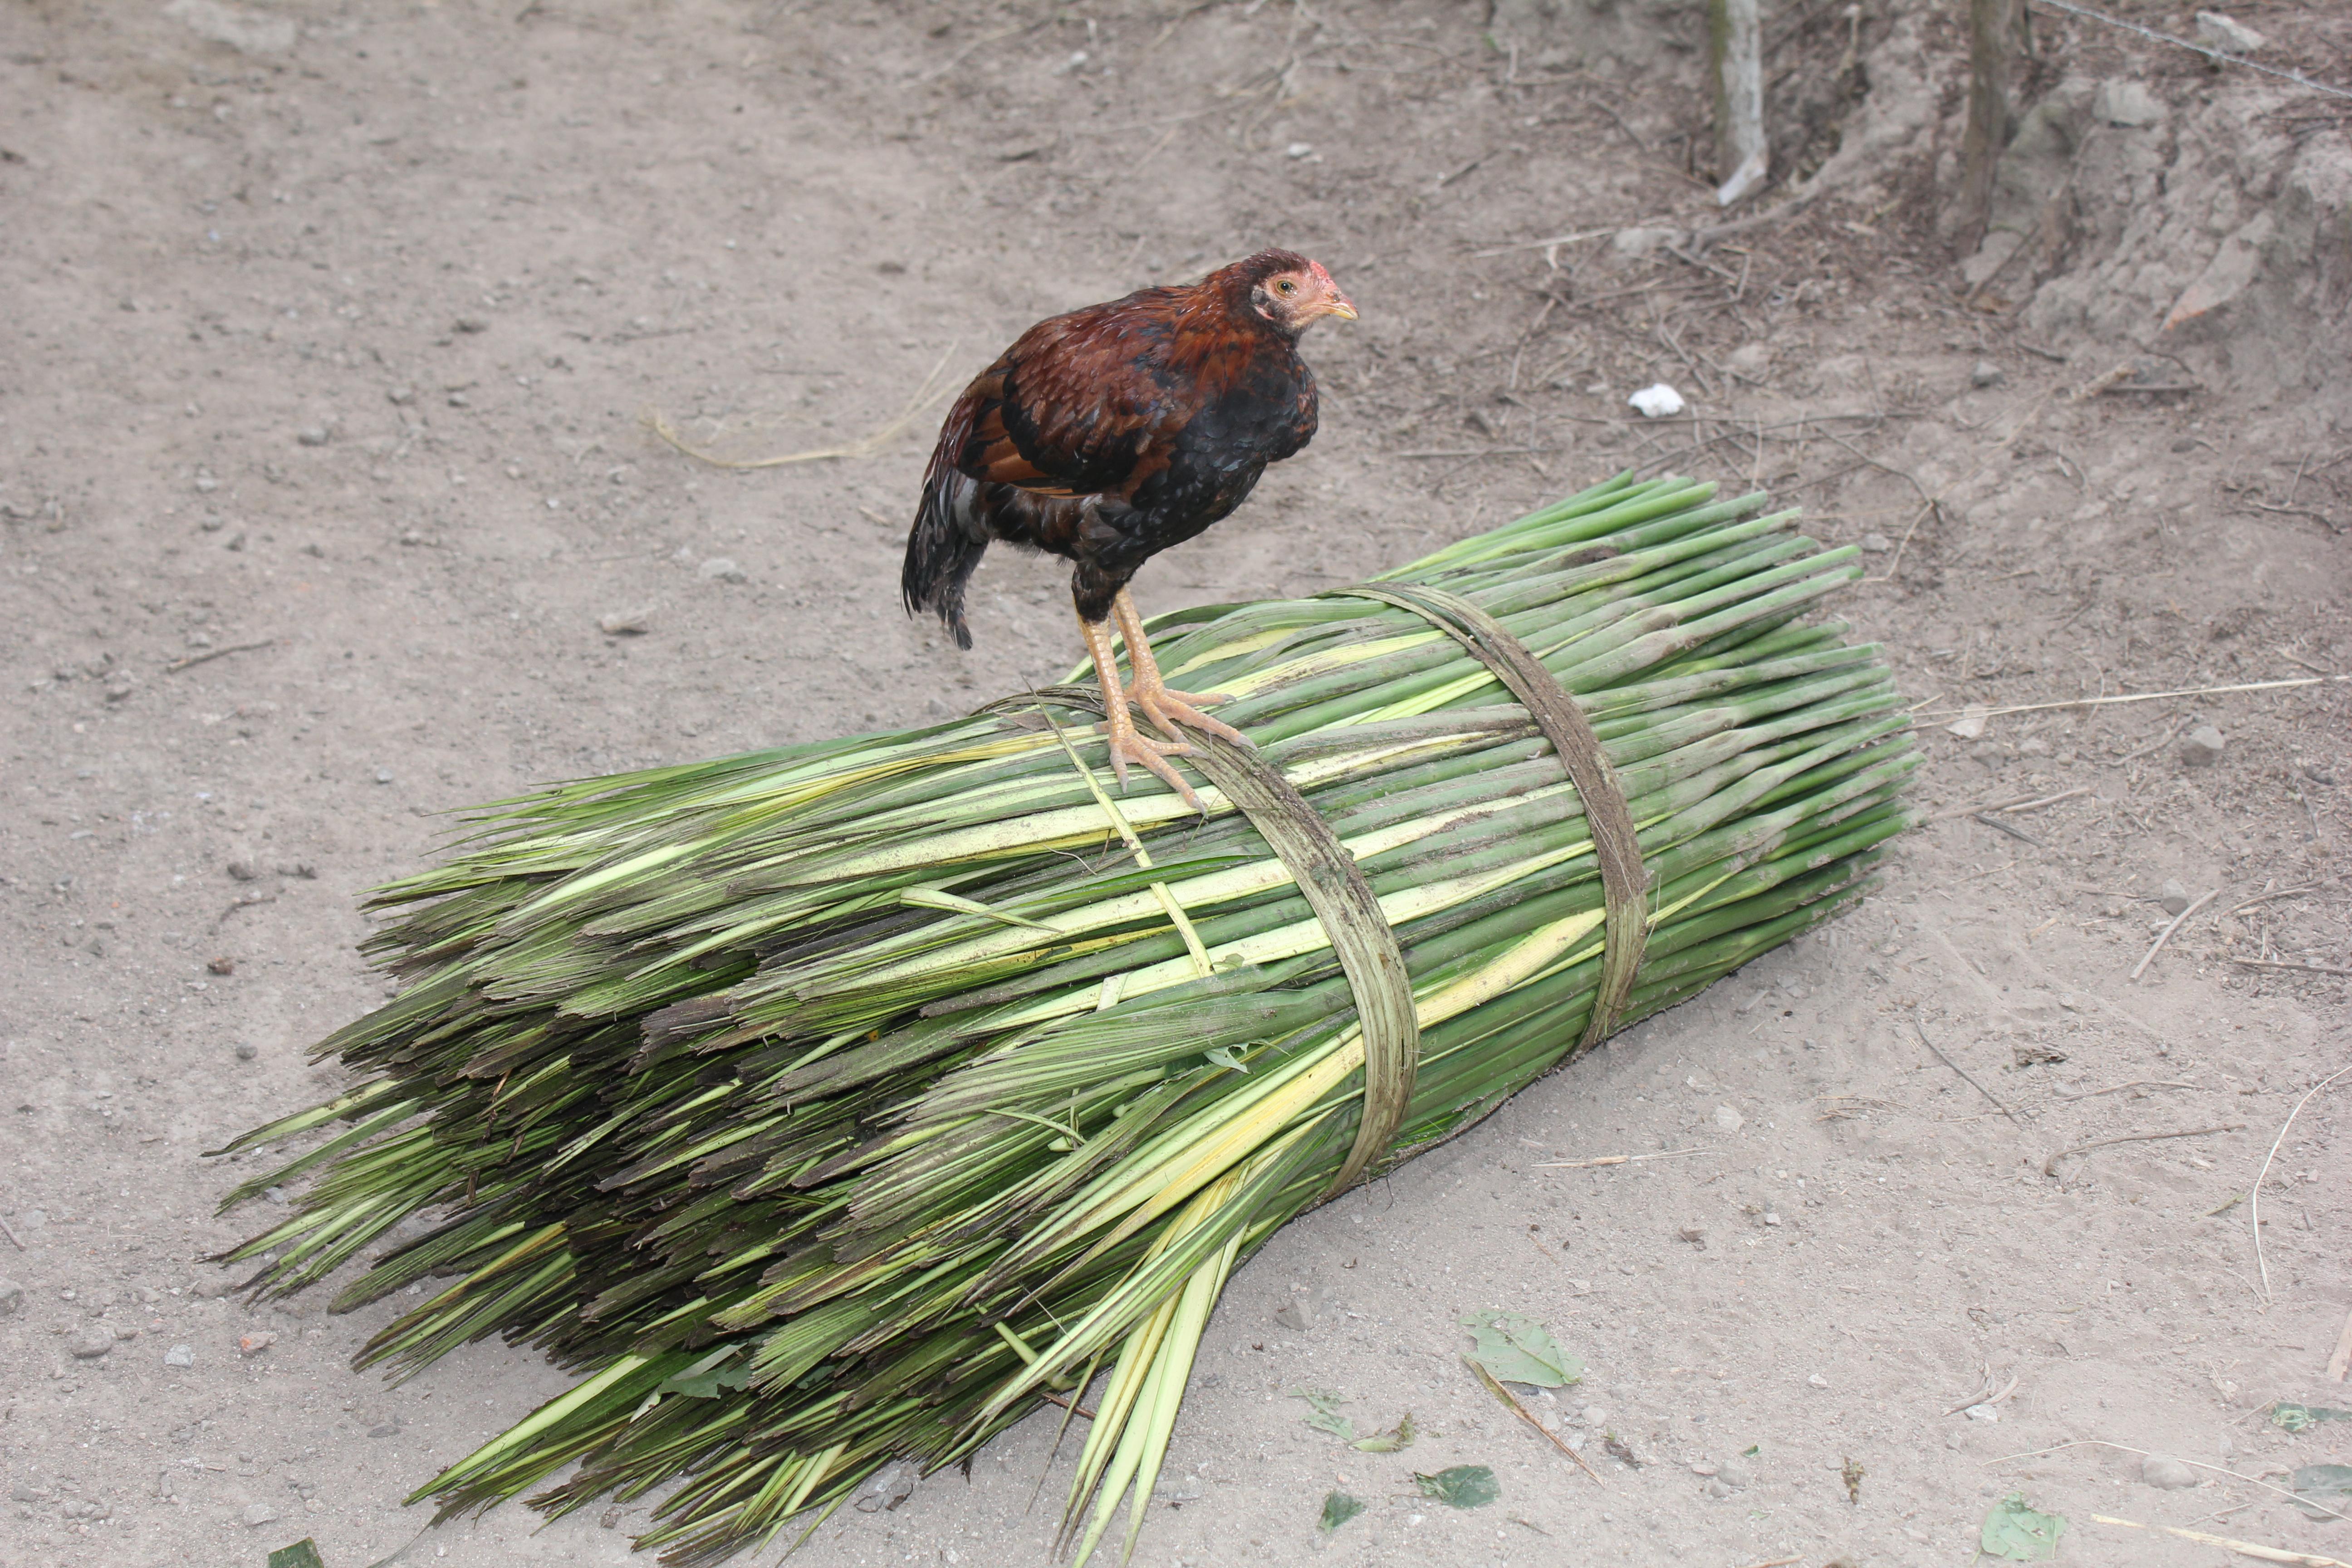 Toquilla straw stalk with hen on top